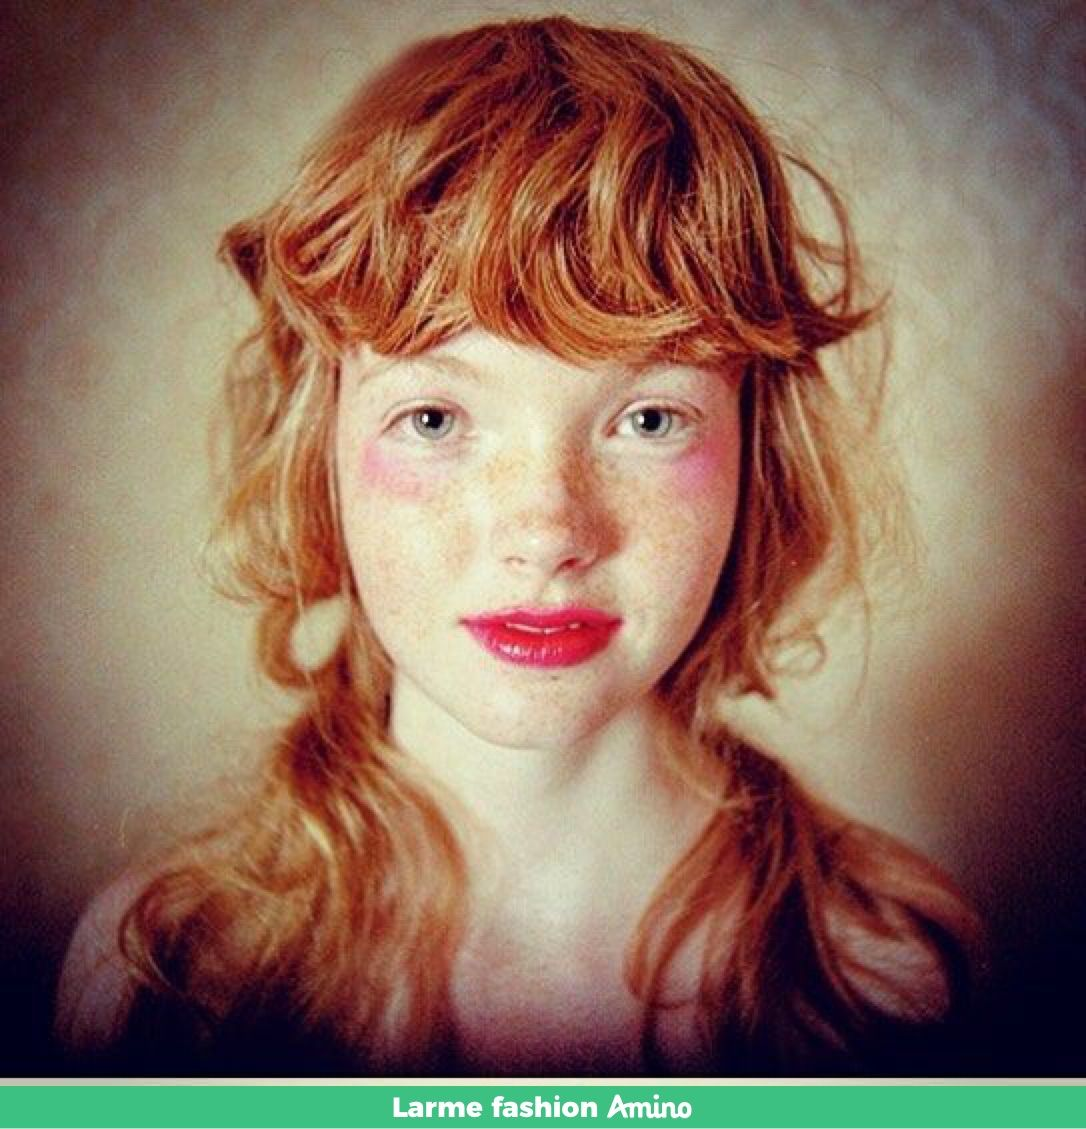 Septum piercing aesthetic  Pin by Art Is Love on Freckles  Pinterest